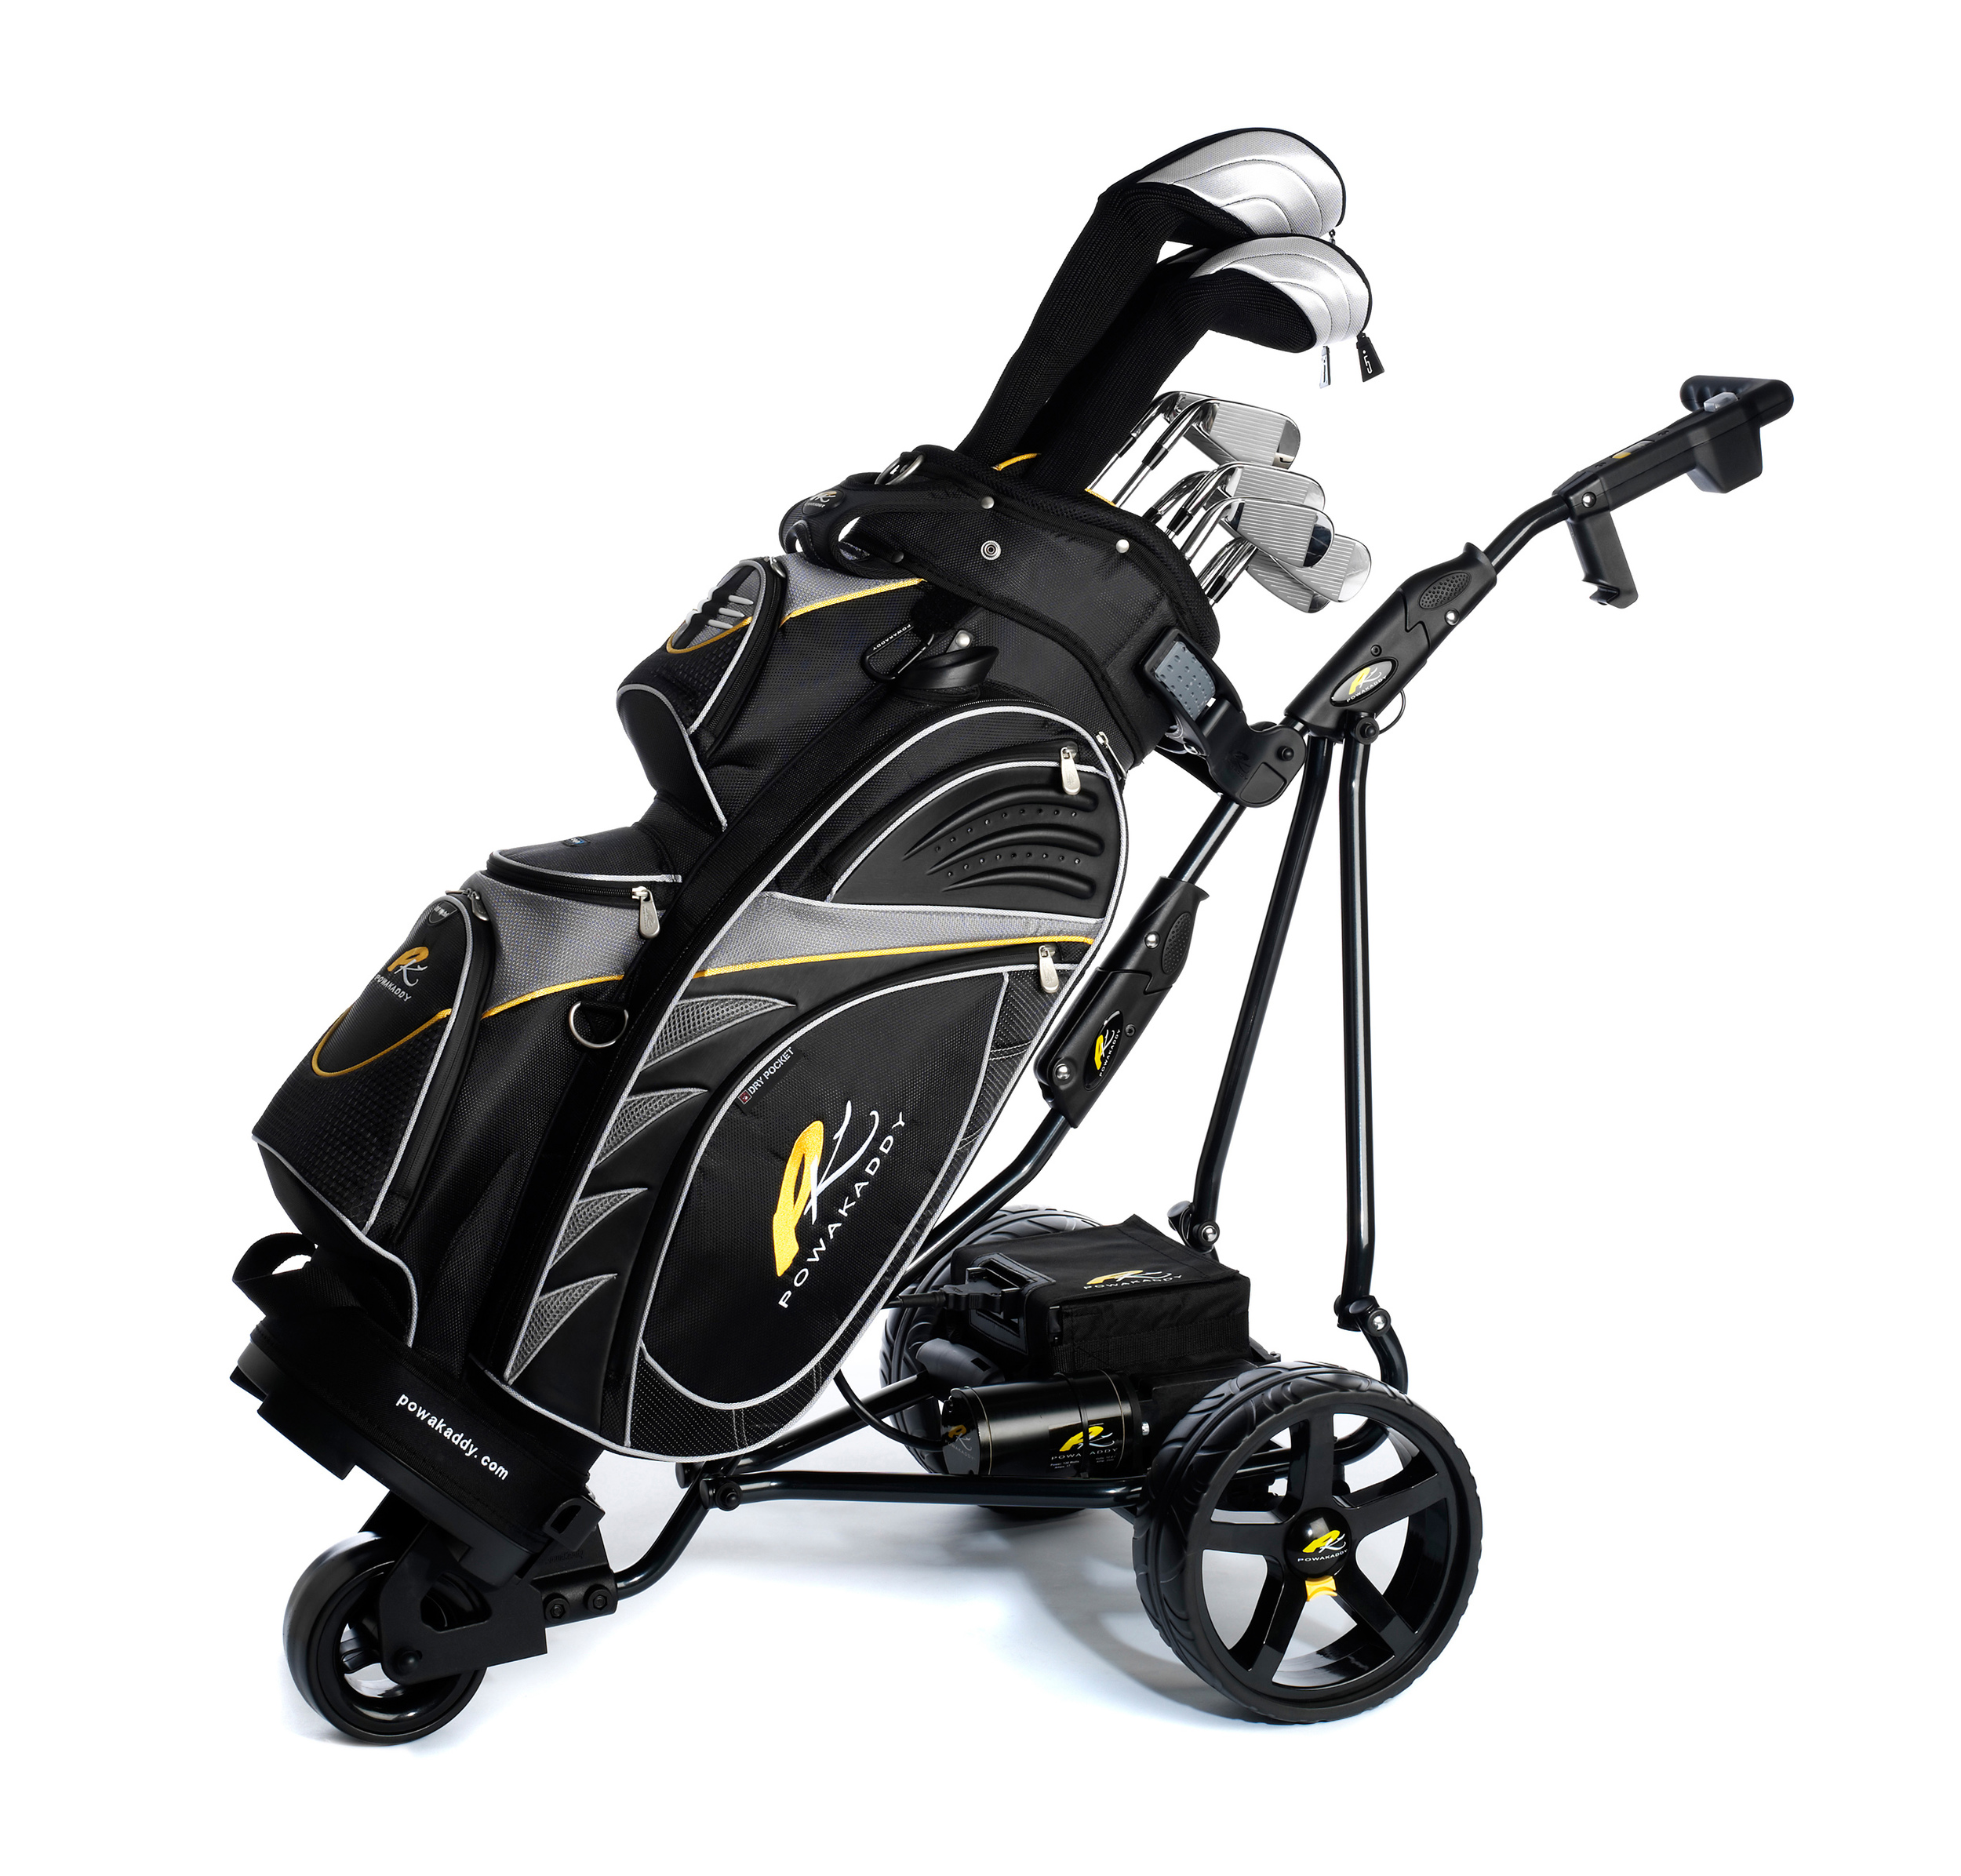 Fw La Sport Silver Black Bag.jpg